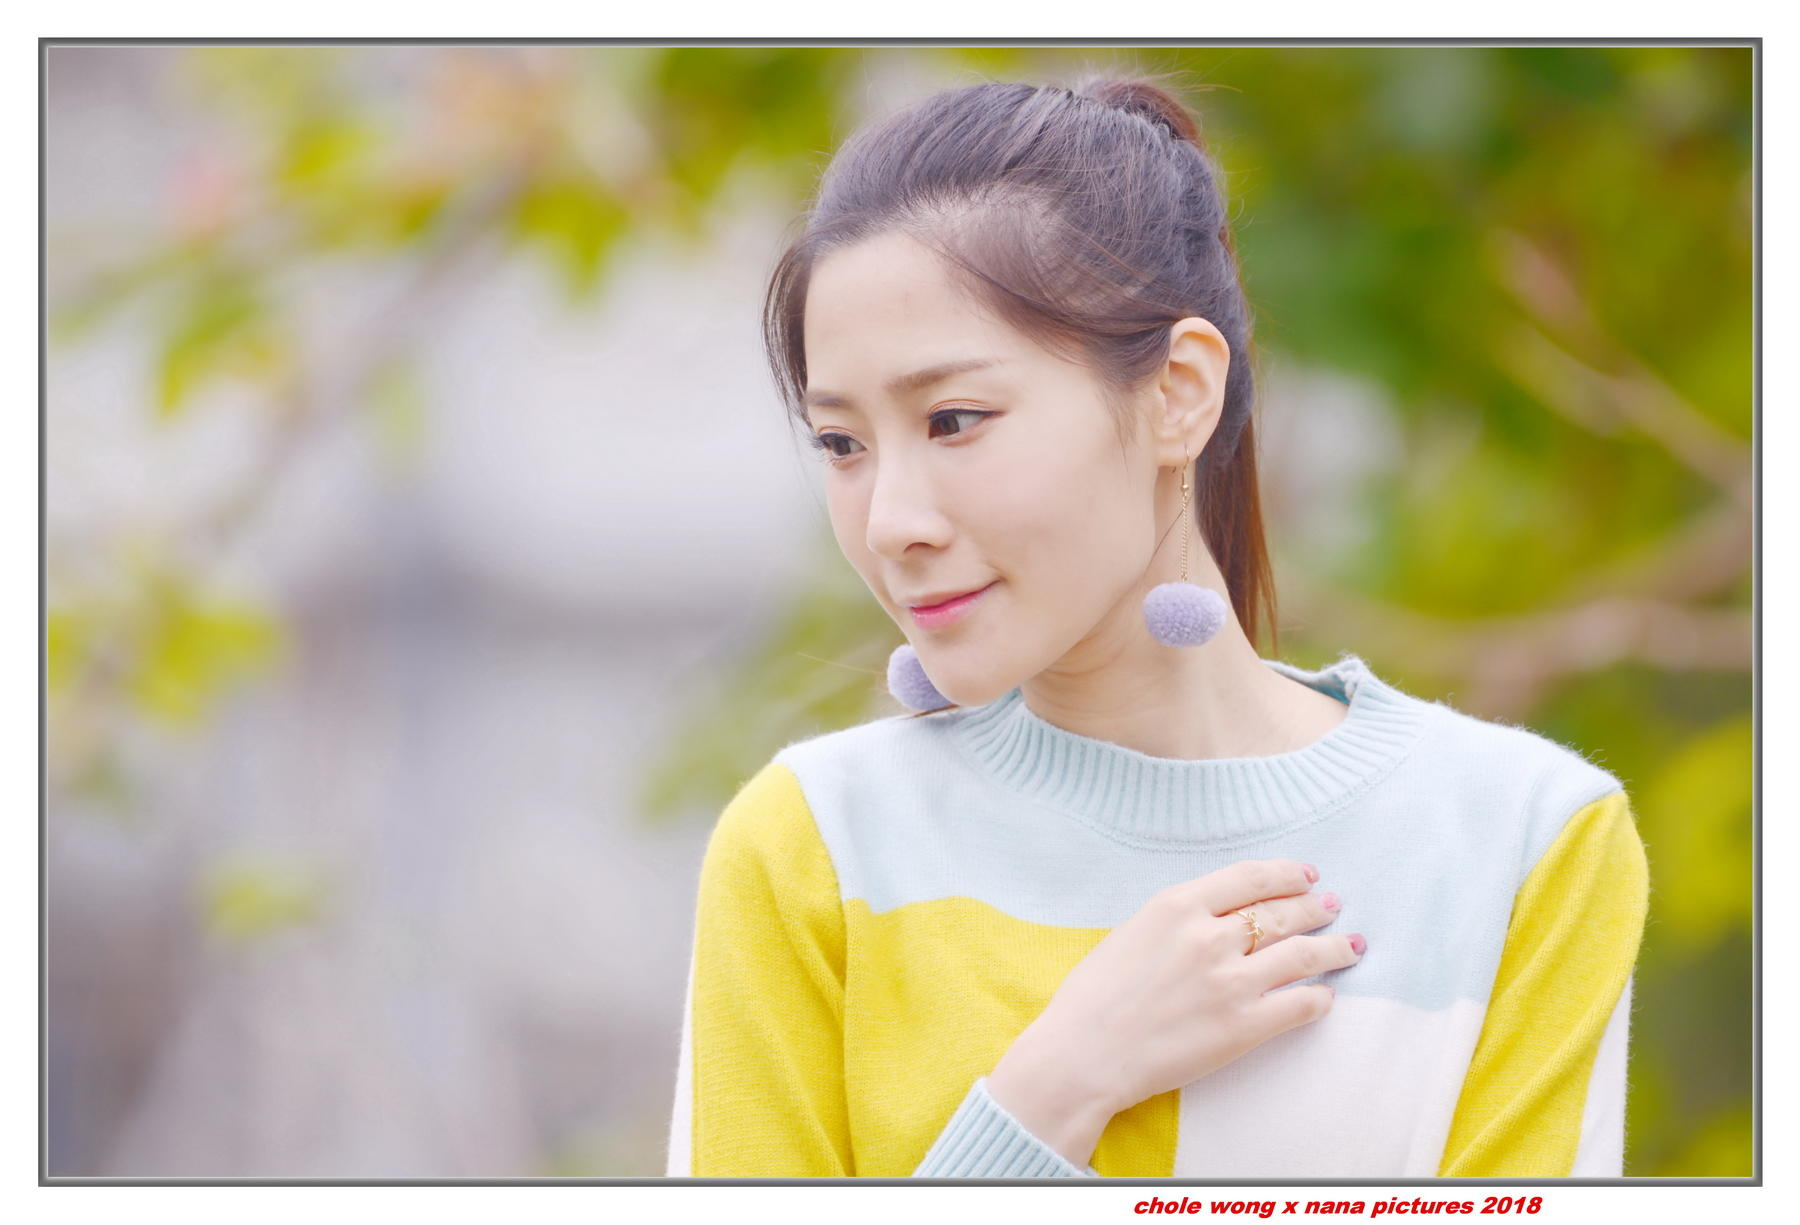 Toey- Aintoaon Nantawong 1 精選女像 No291 -- fotop.net photo sharing network